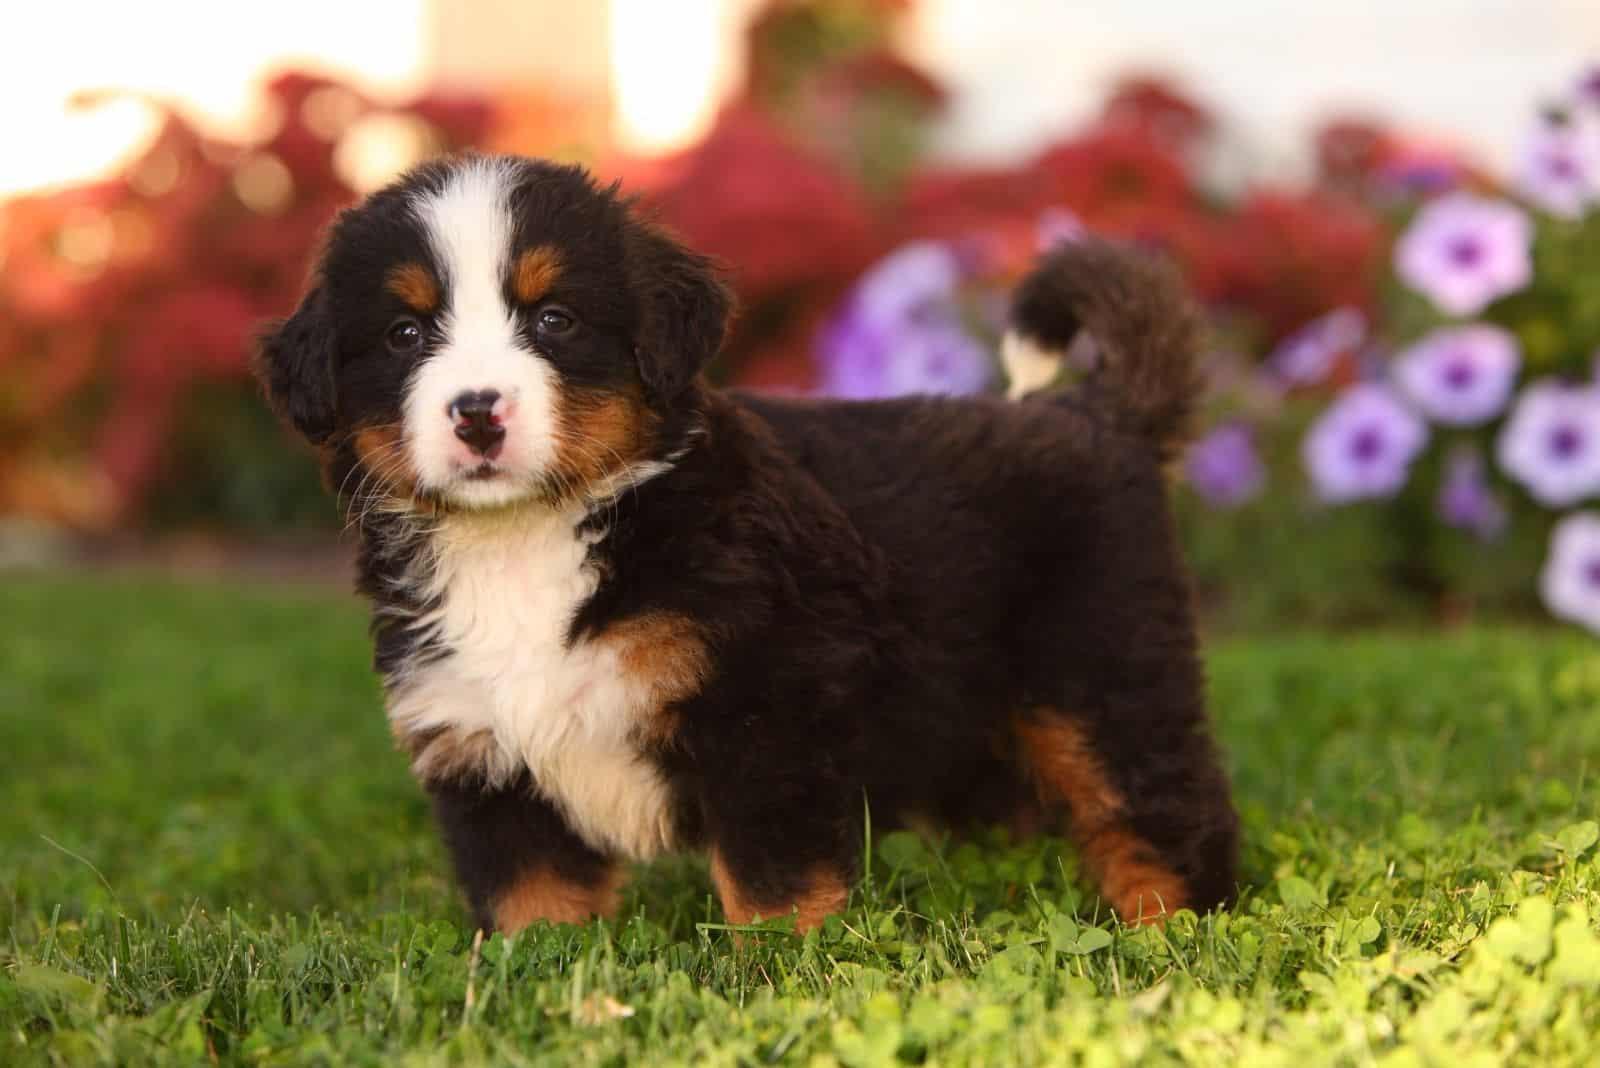 cute mini bernie puppy standing in the flower garden